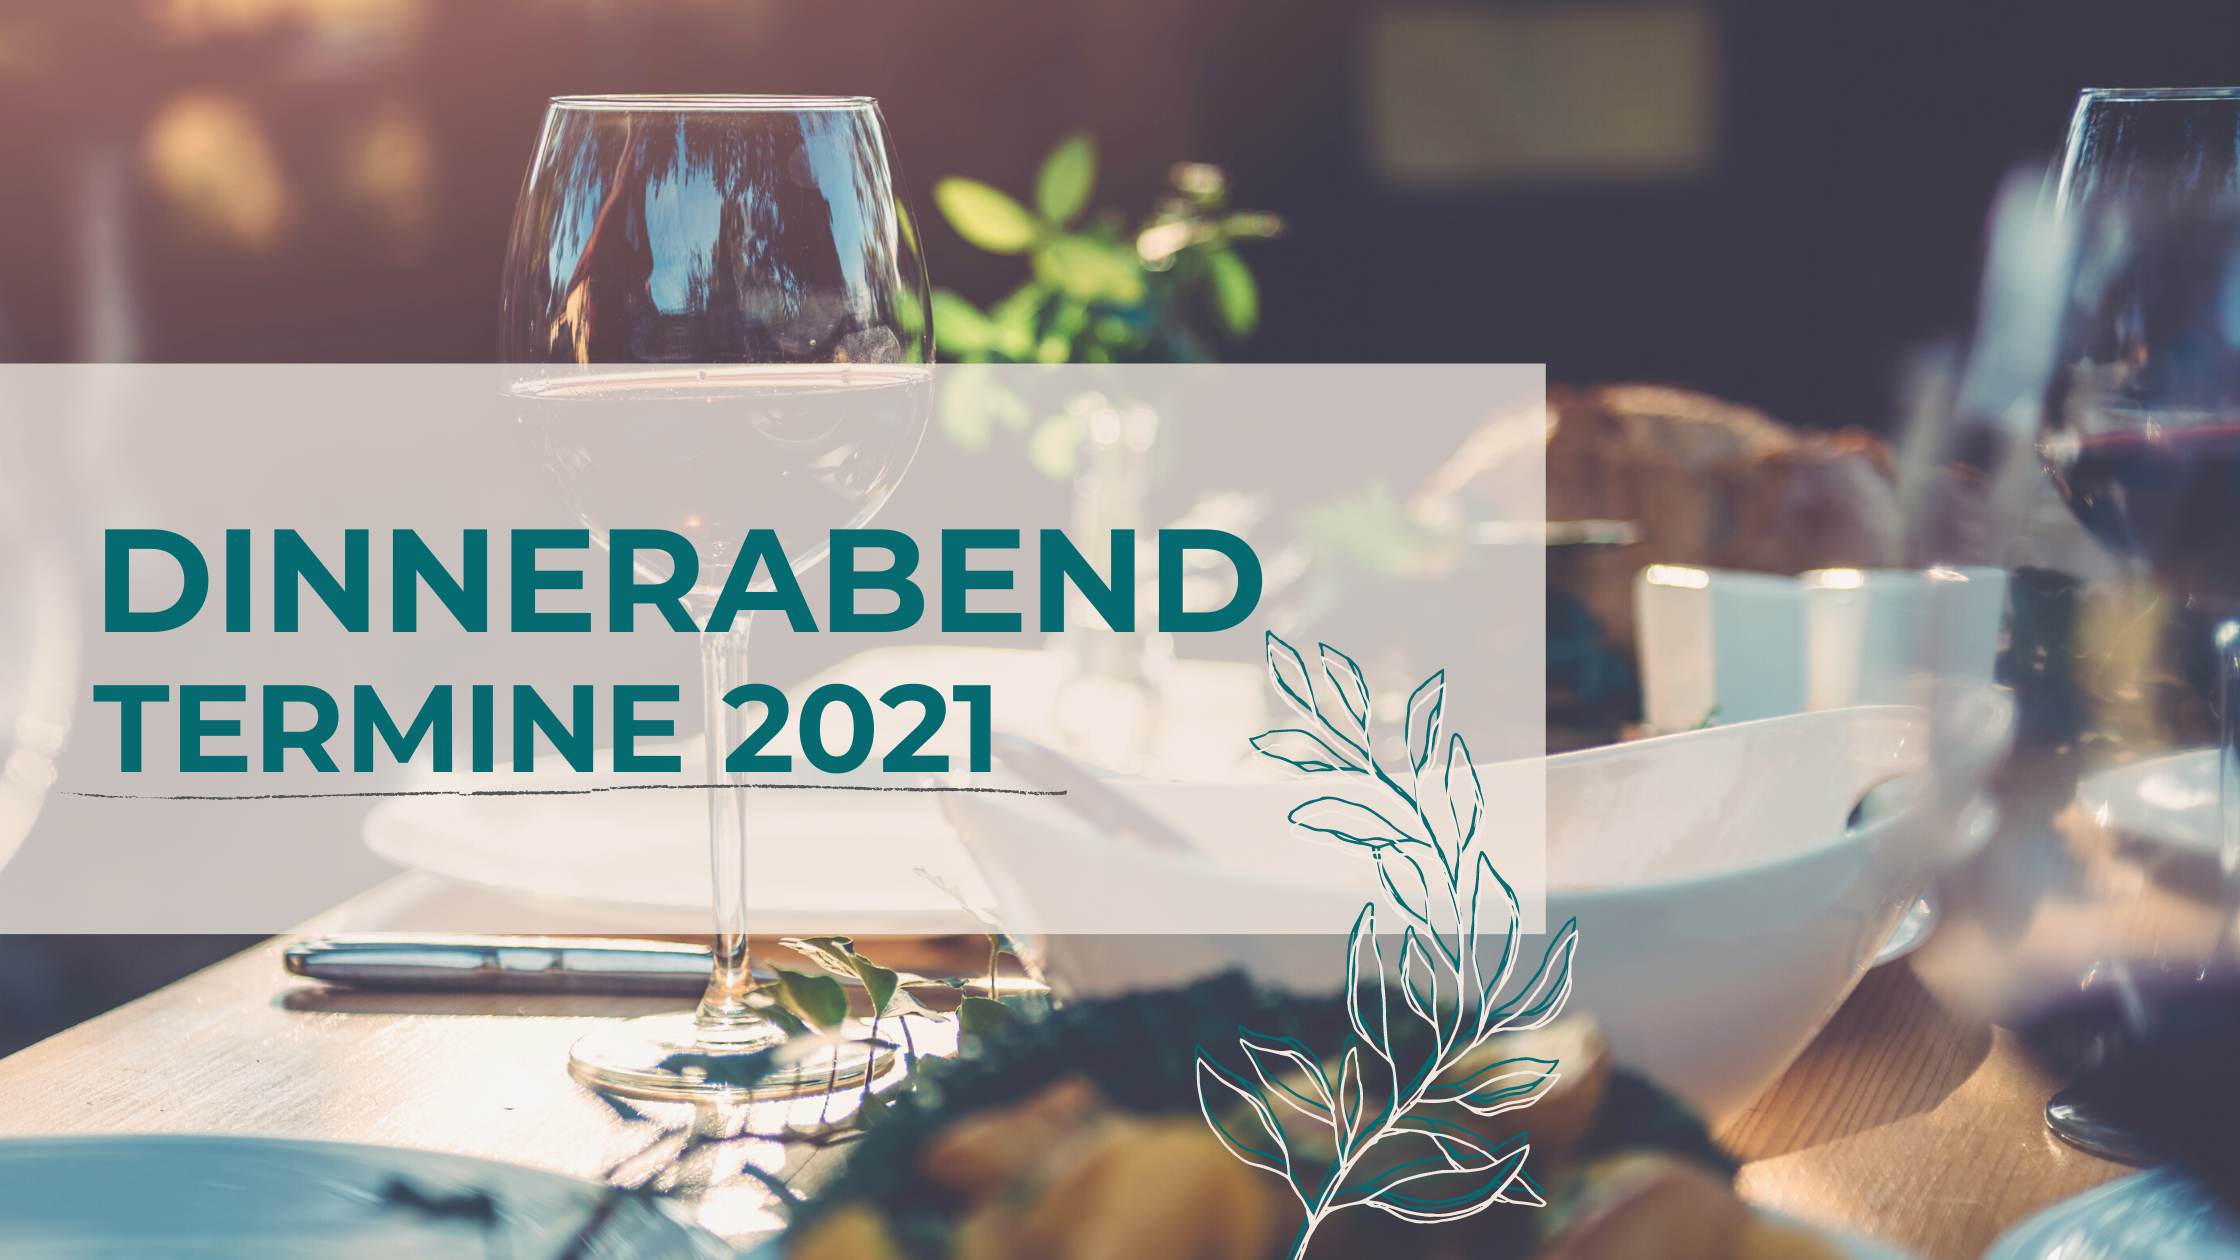 Dinnerabend Termine 2021